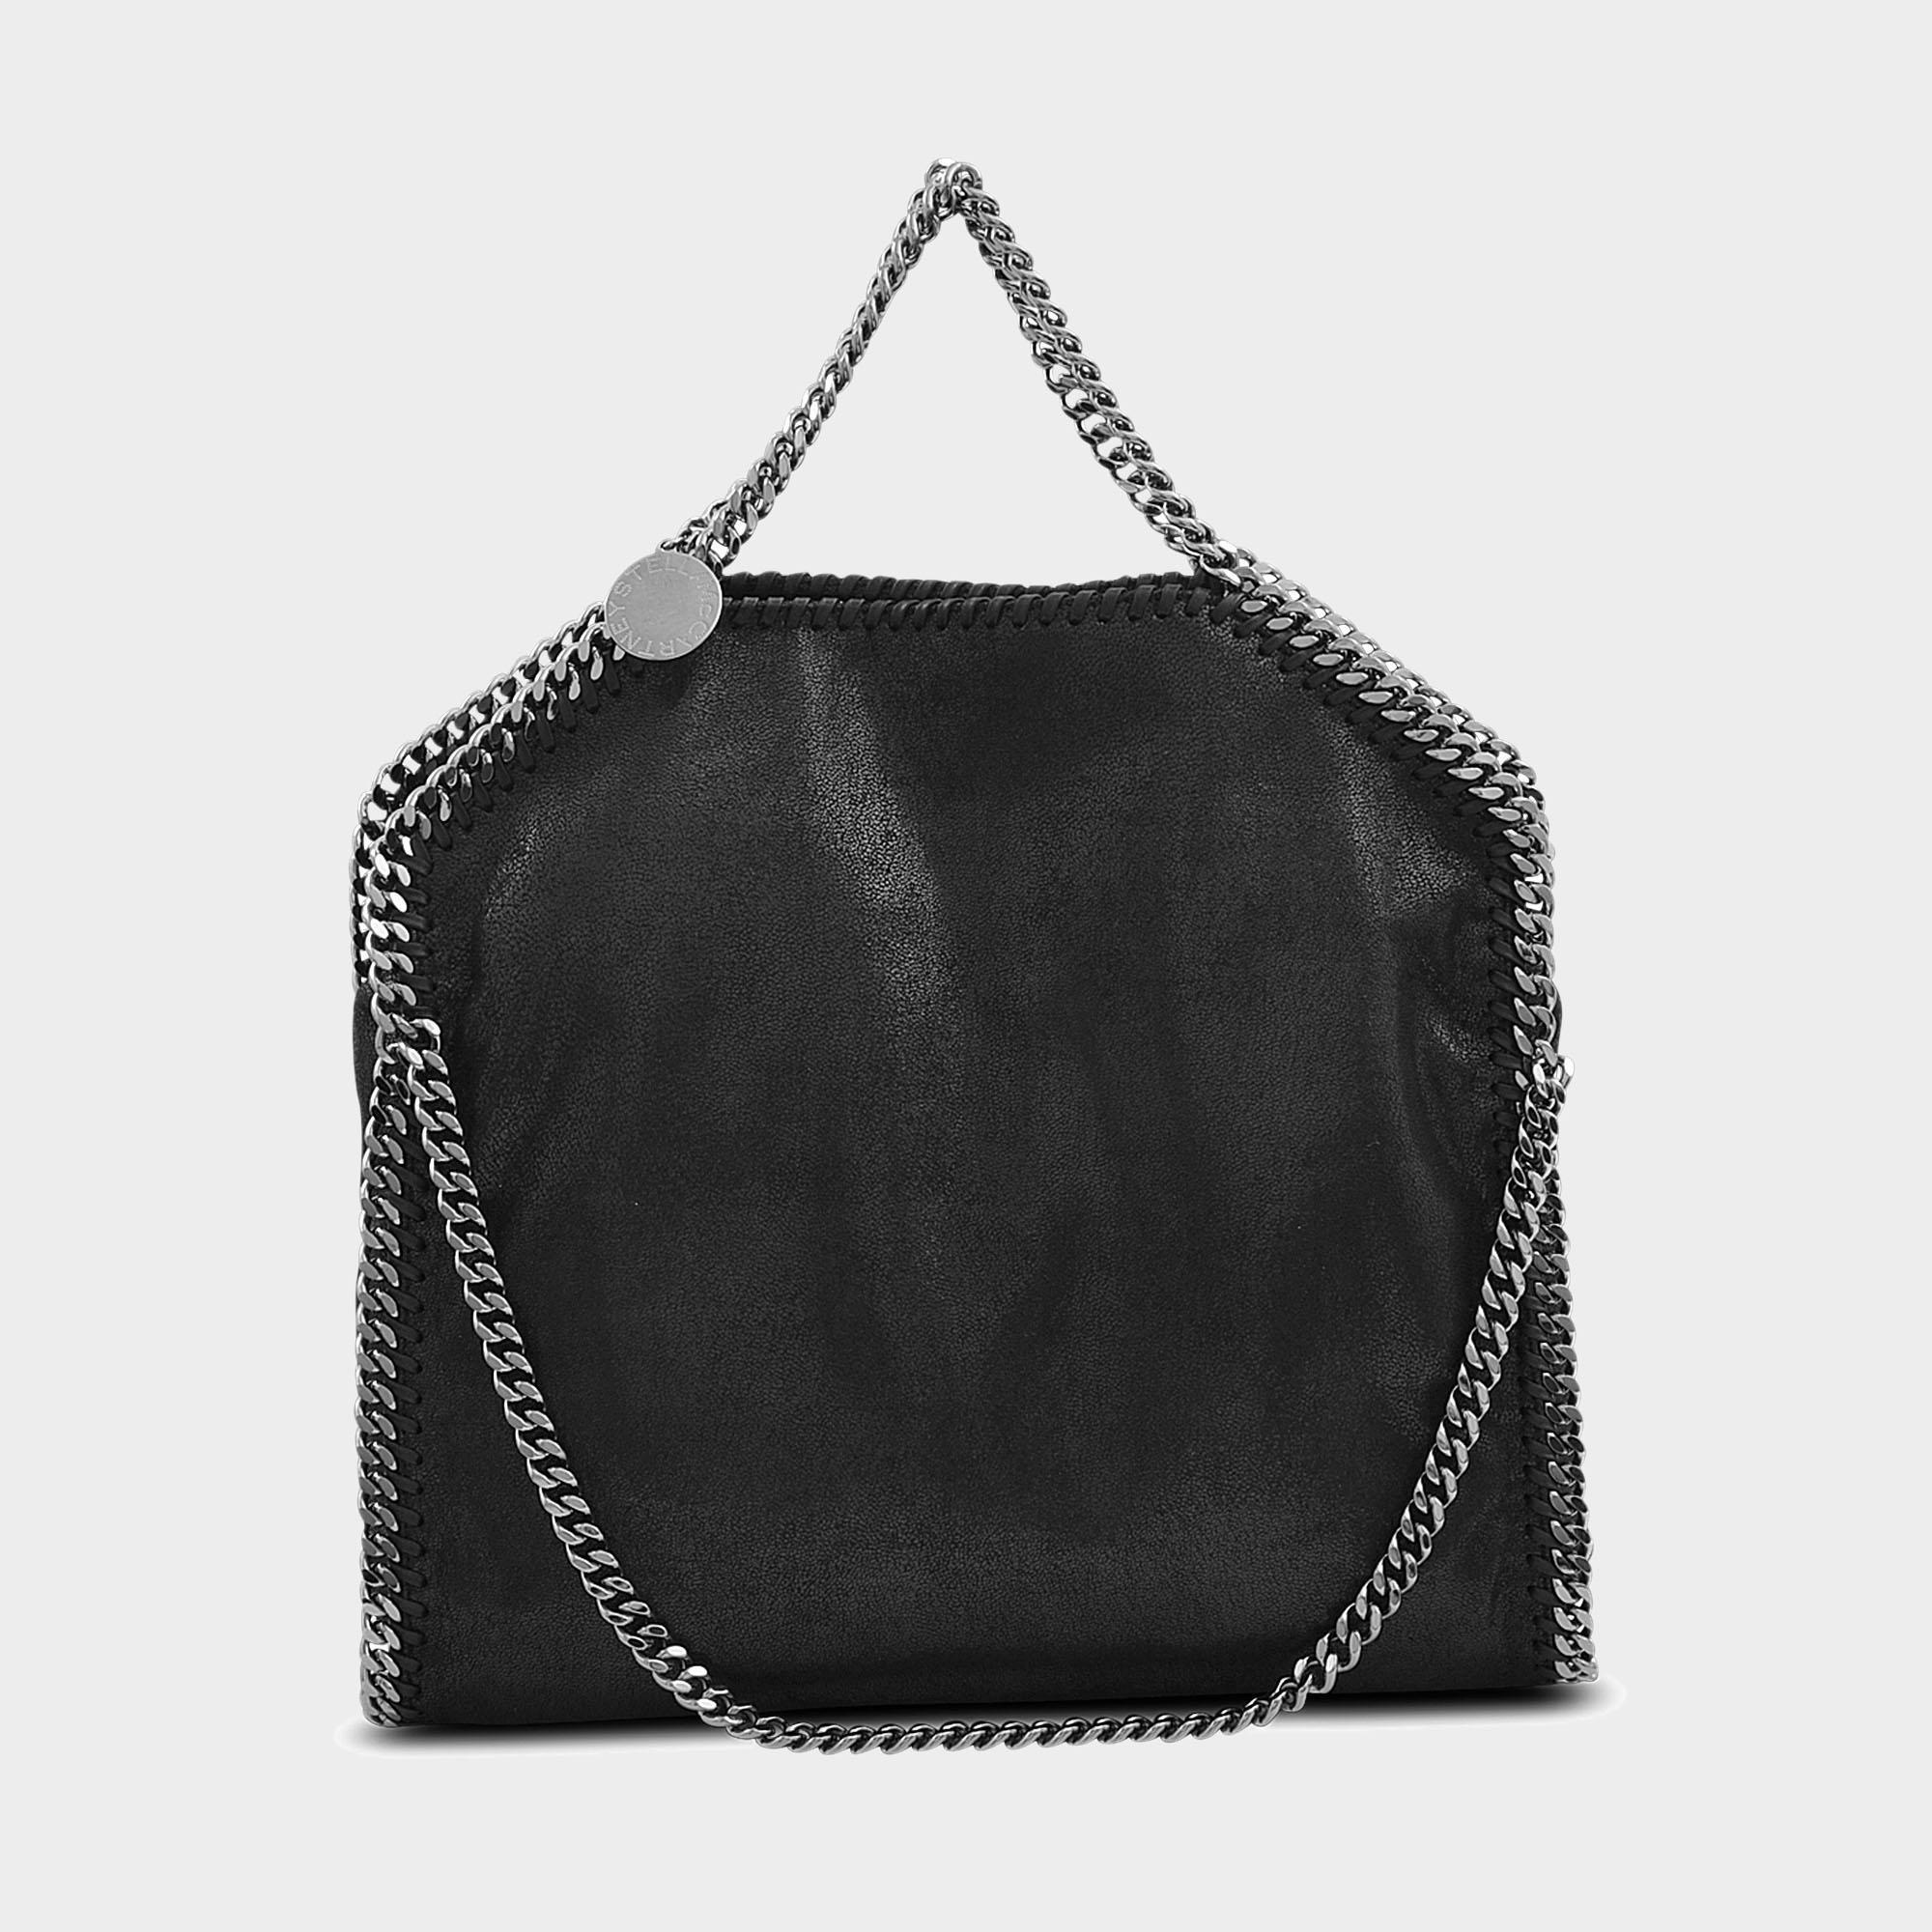 Stella McCartney. Women s Shaggy Deer Falabella Three Chains Bag In Black Eco  Leather 9c65dbaa36760